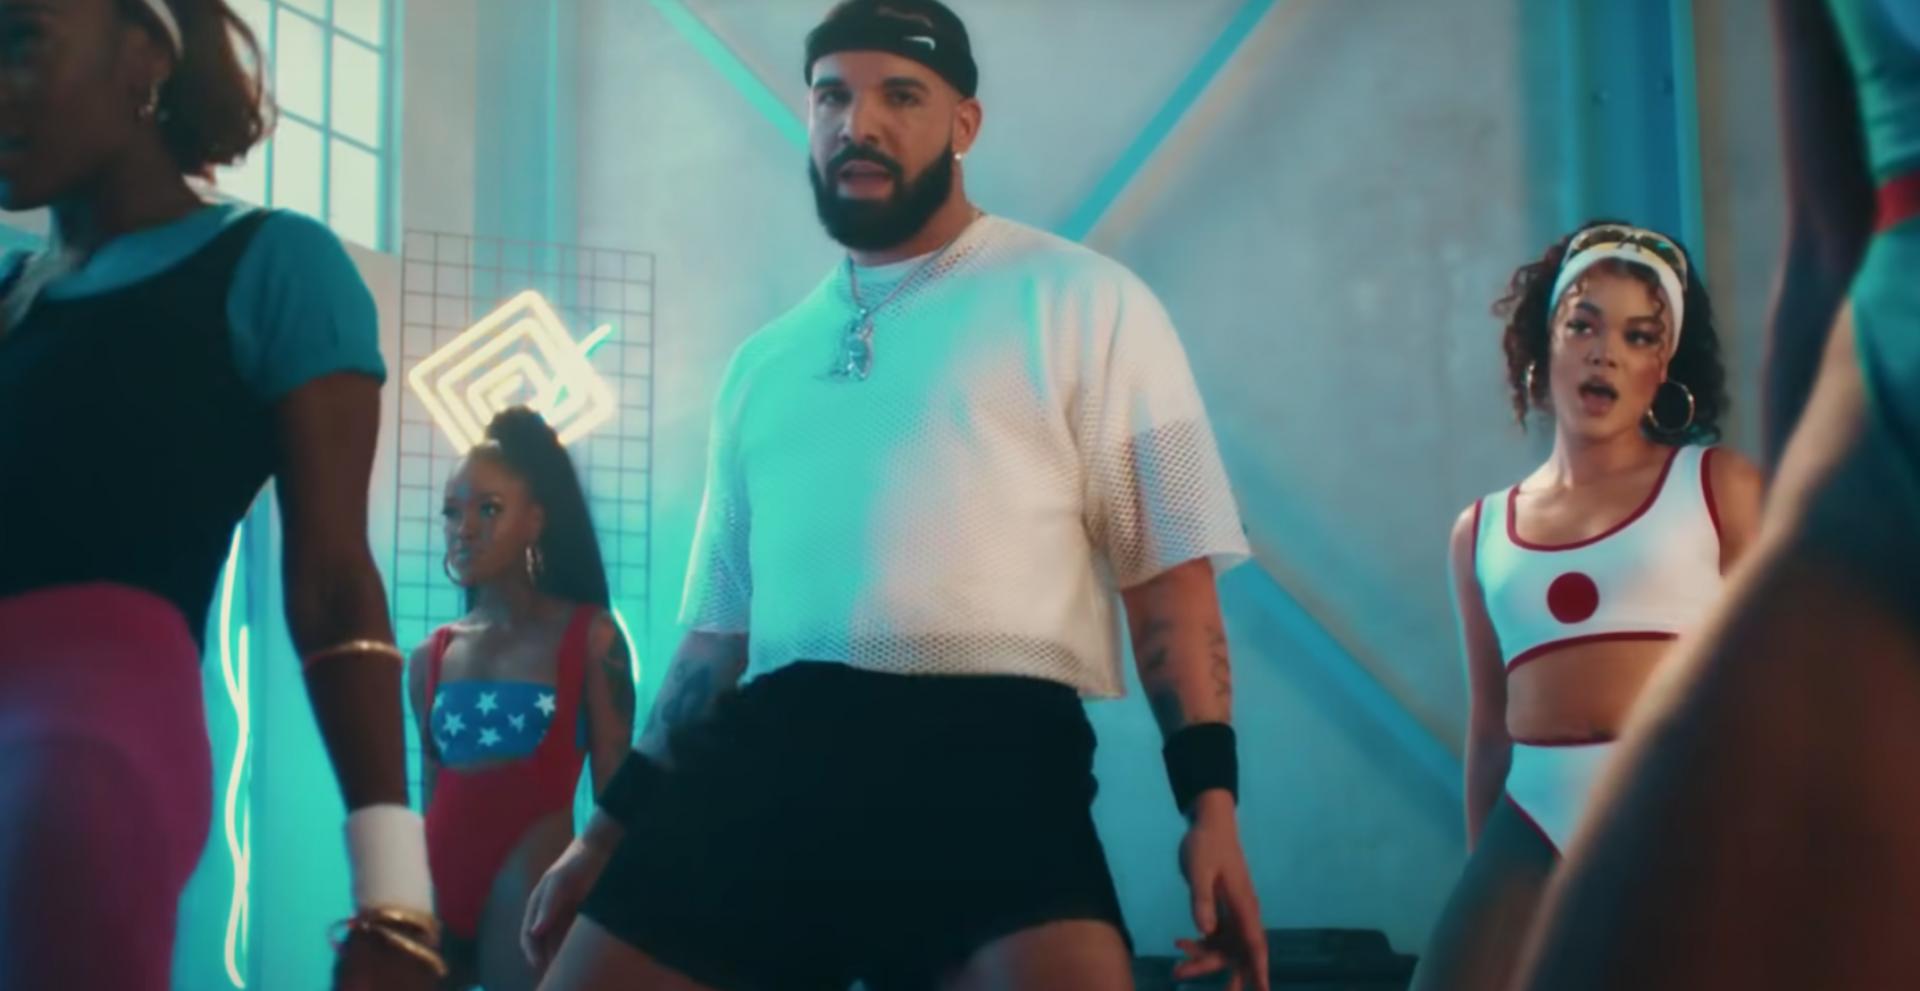 Drake costume